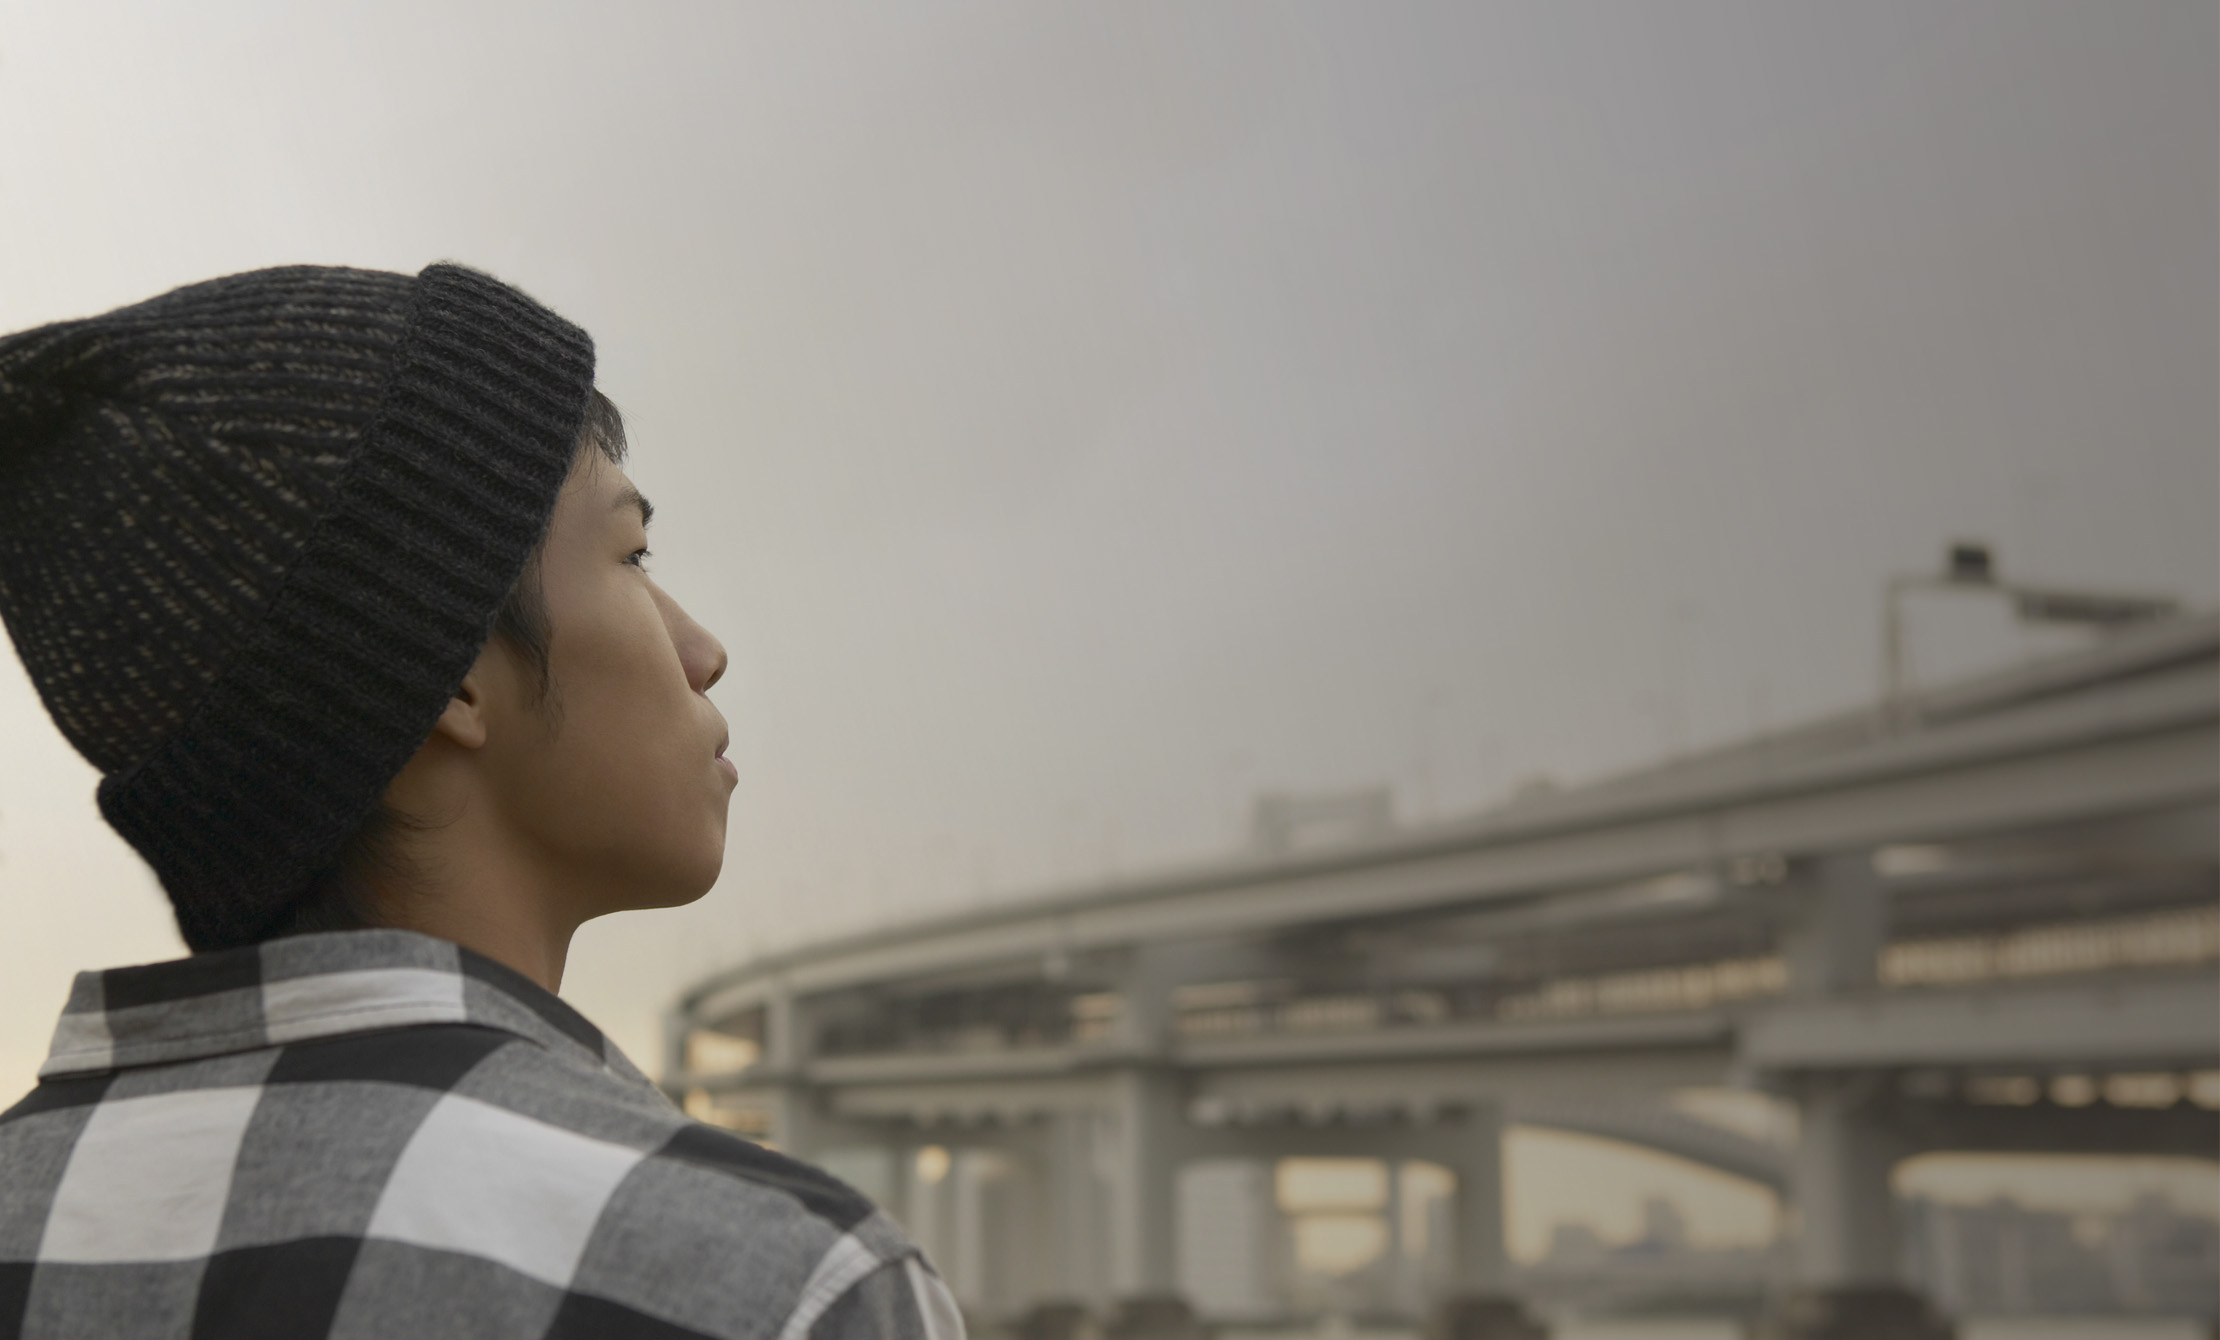 Young man in an urban setting looks toward the horizon | Jeune homme en milieu urbain regarde vers l'horizon